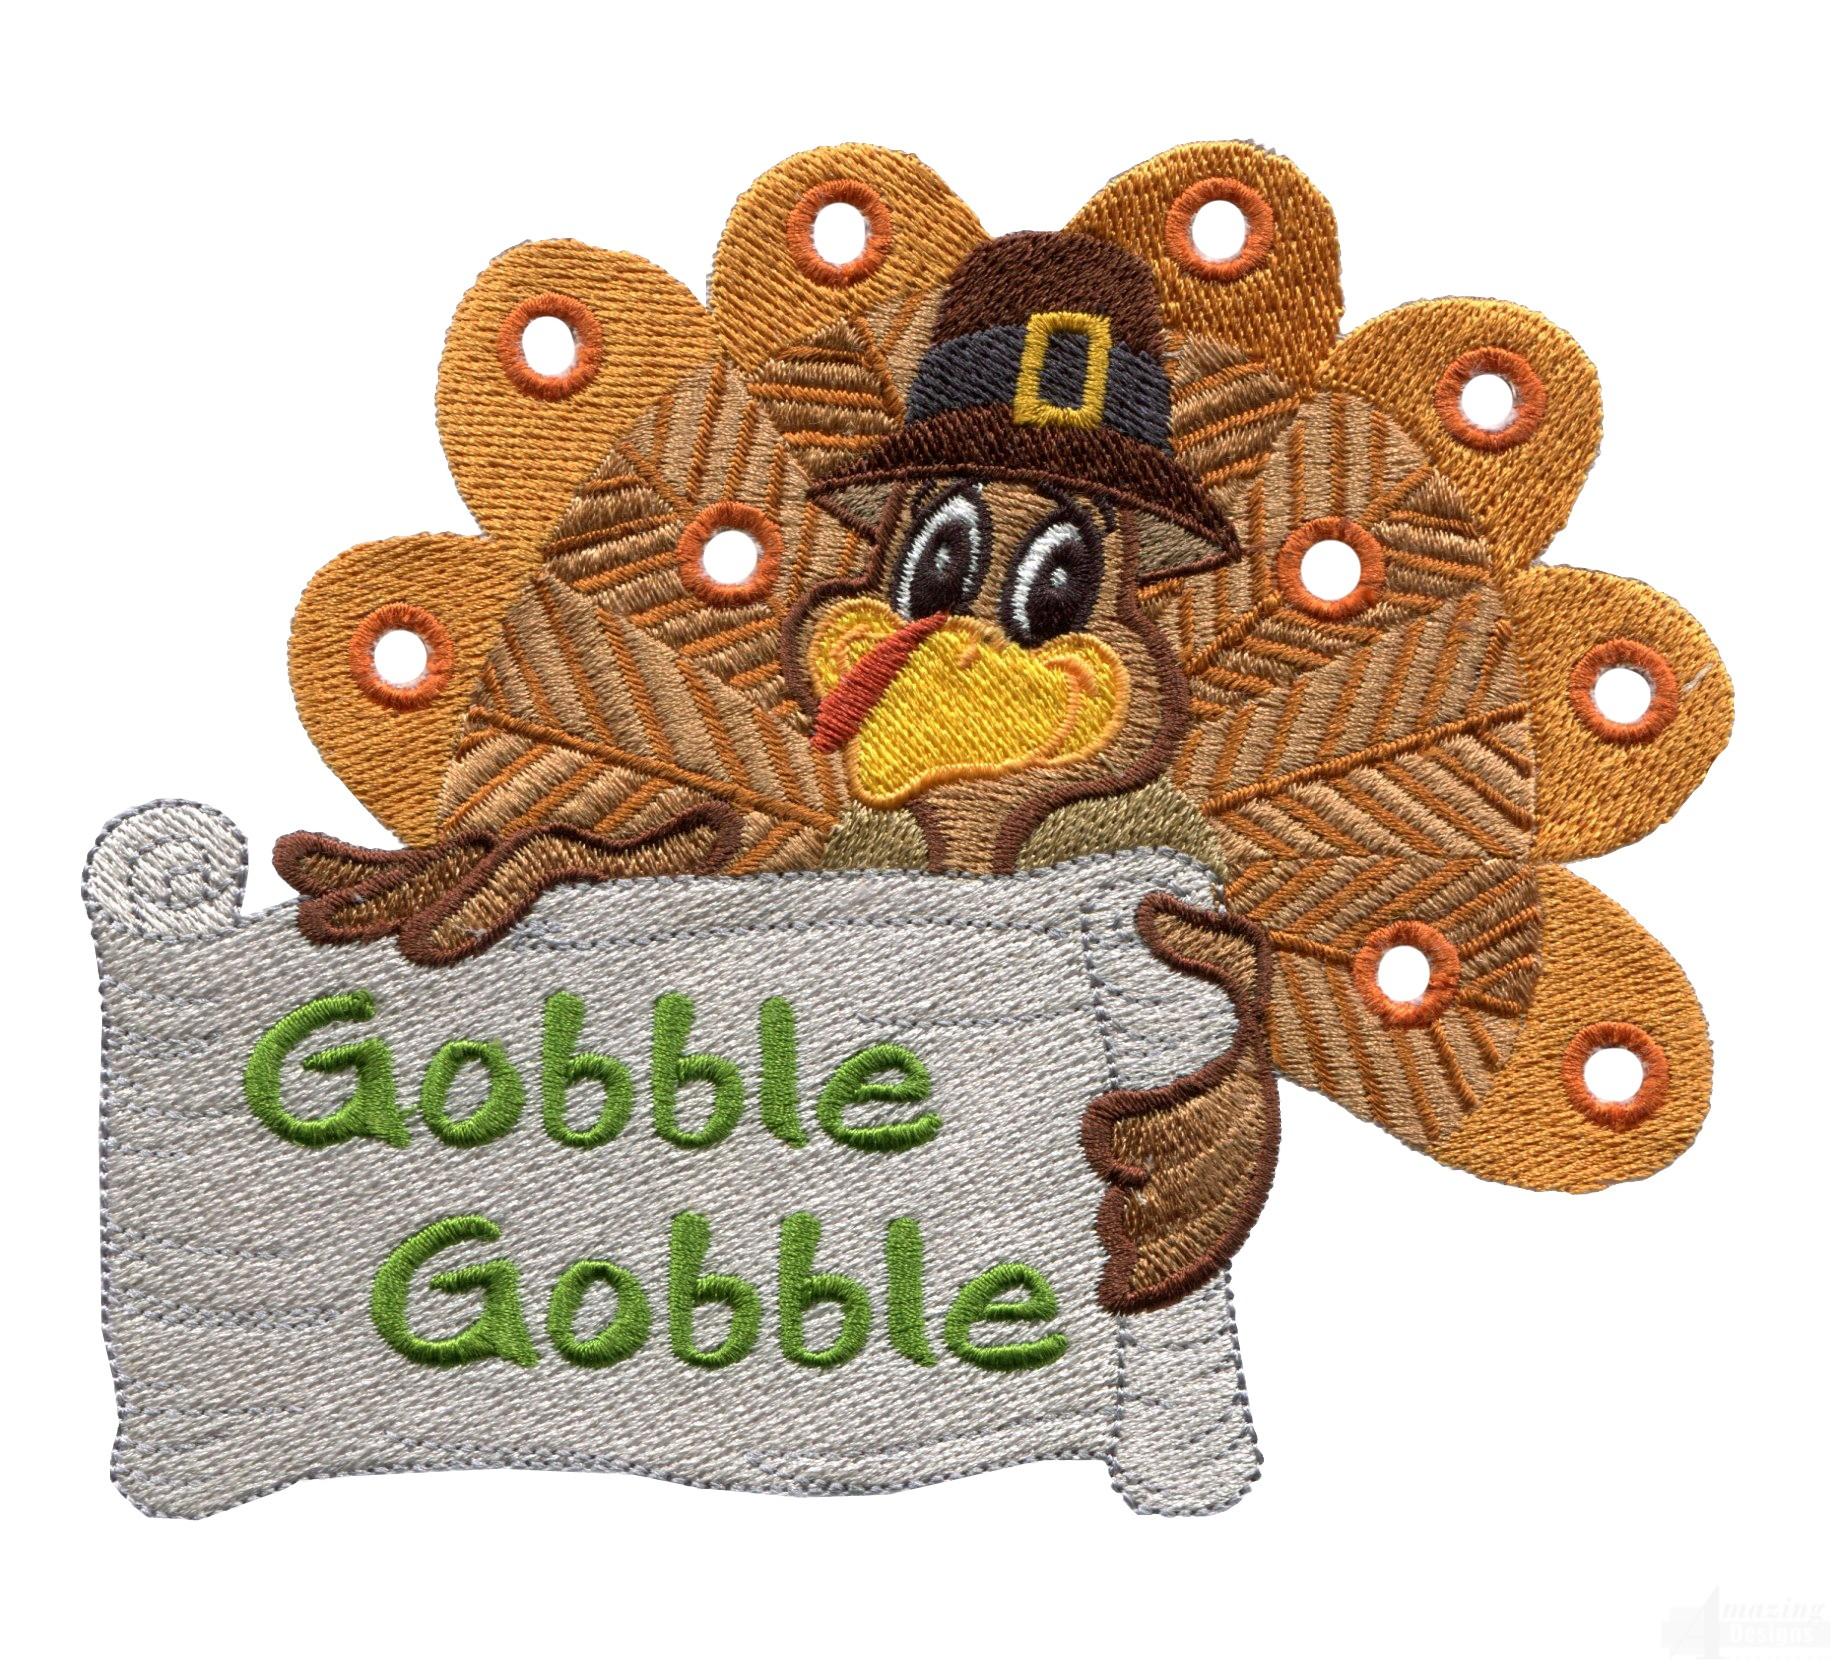 Gobble turkey embroidery design